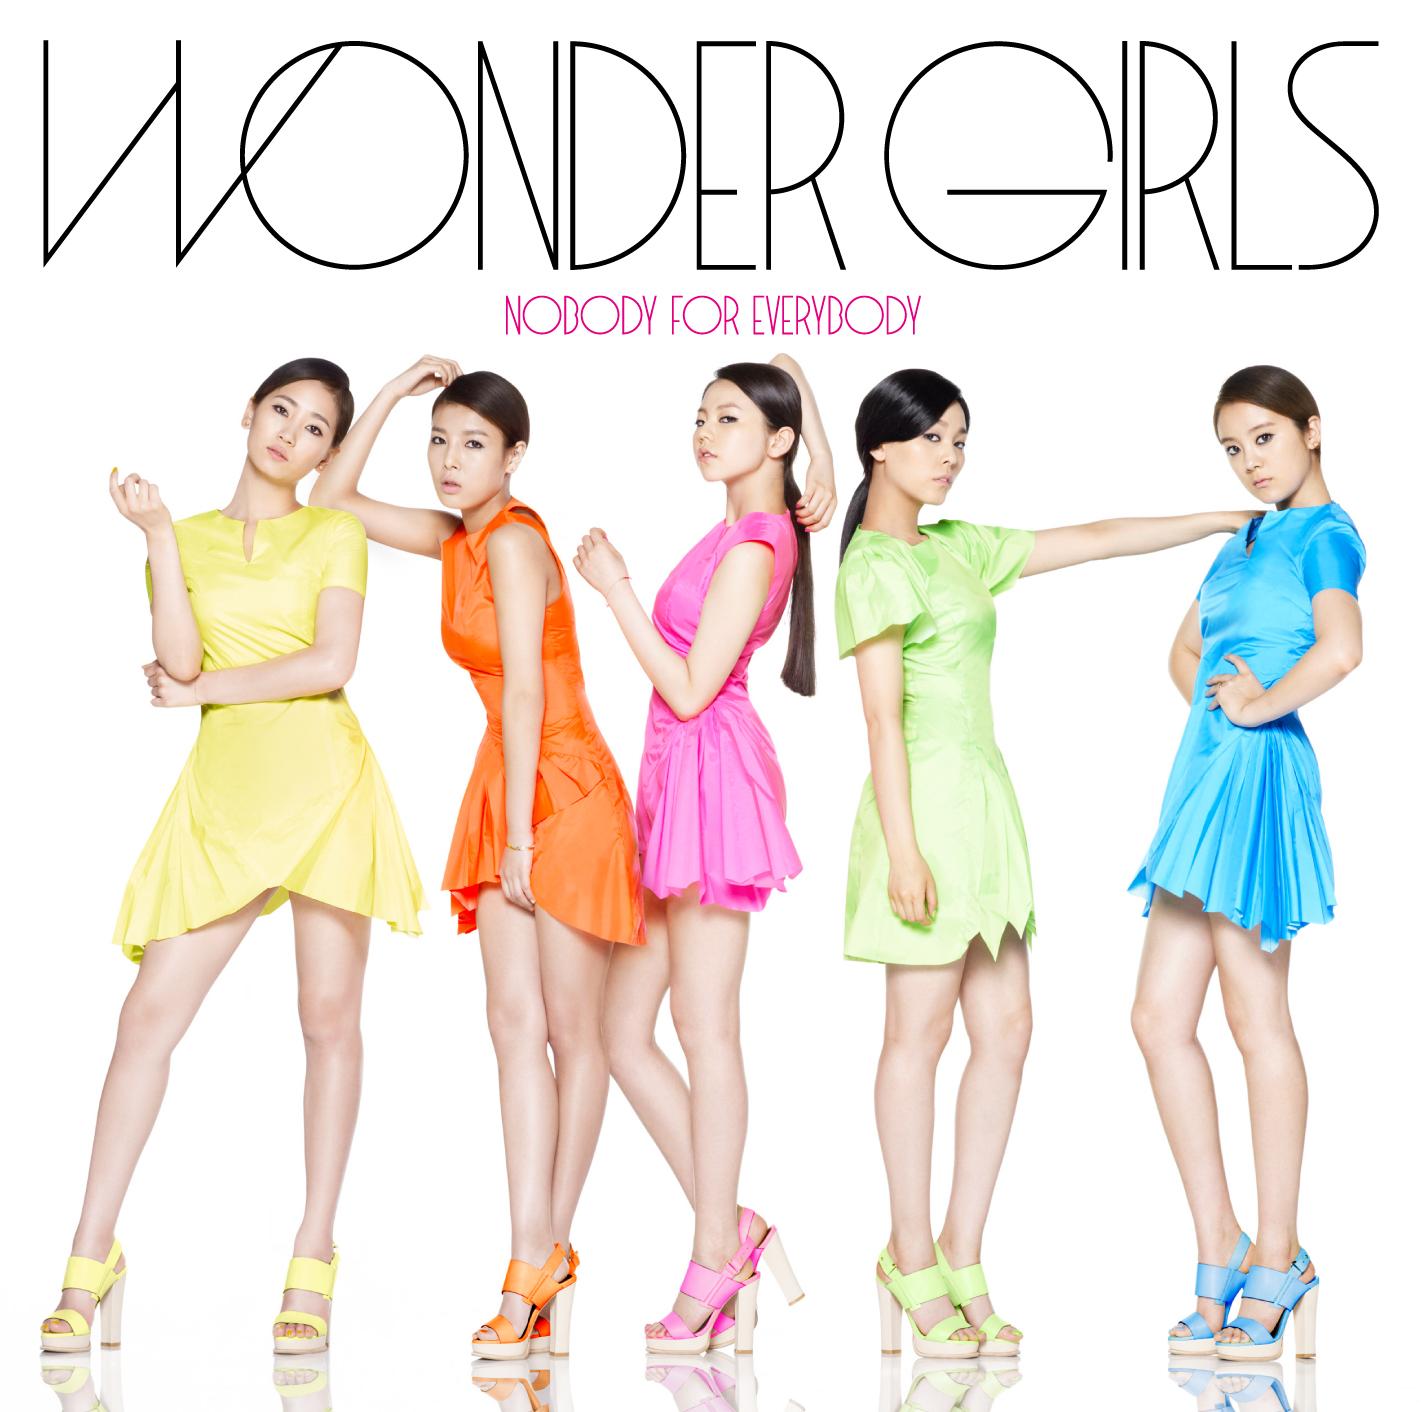 Nobody wonder girls korean lyrics, naked tits images